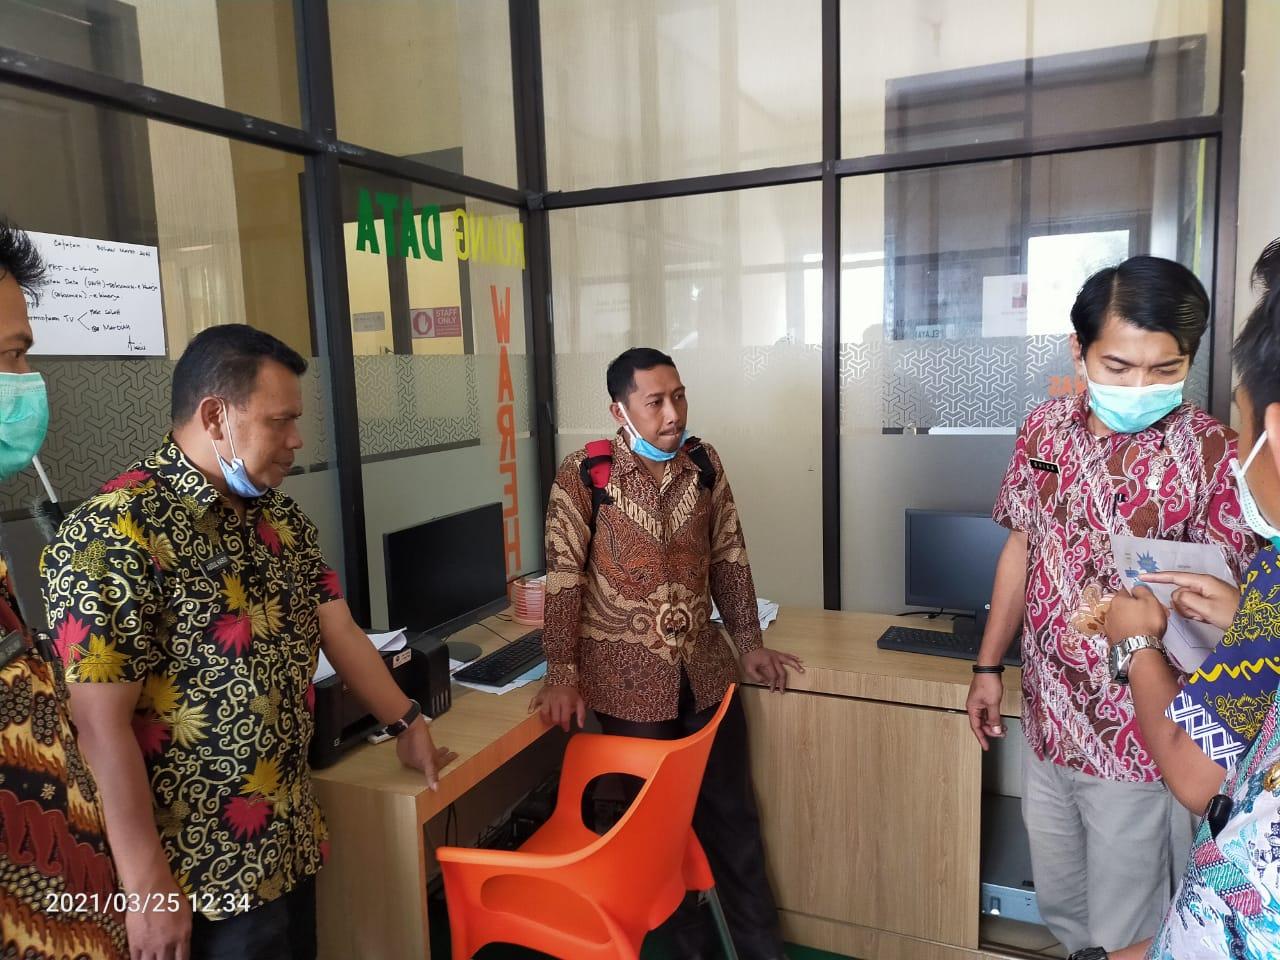 Disdukcapil Jeneponto Lakukan Konsultasi Terkait Perjanjian Kerjasama Pemanfaatan Data dan Pengolahan DWH ke Disdukcapil Bantaeng